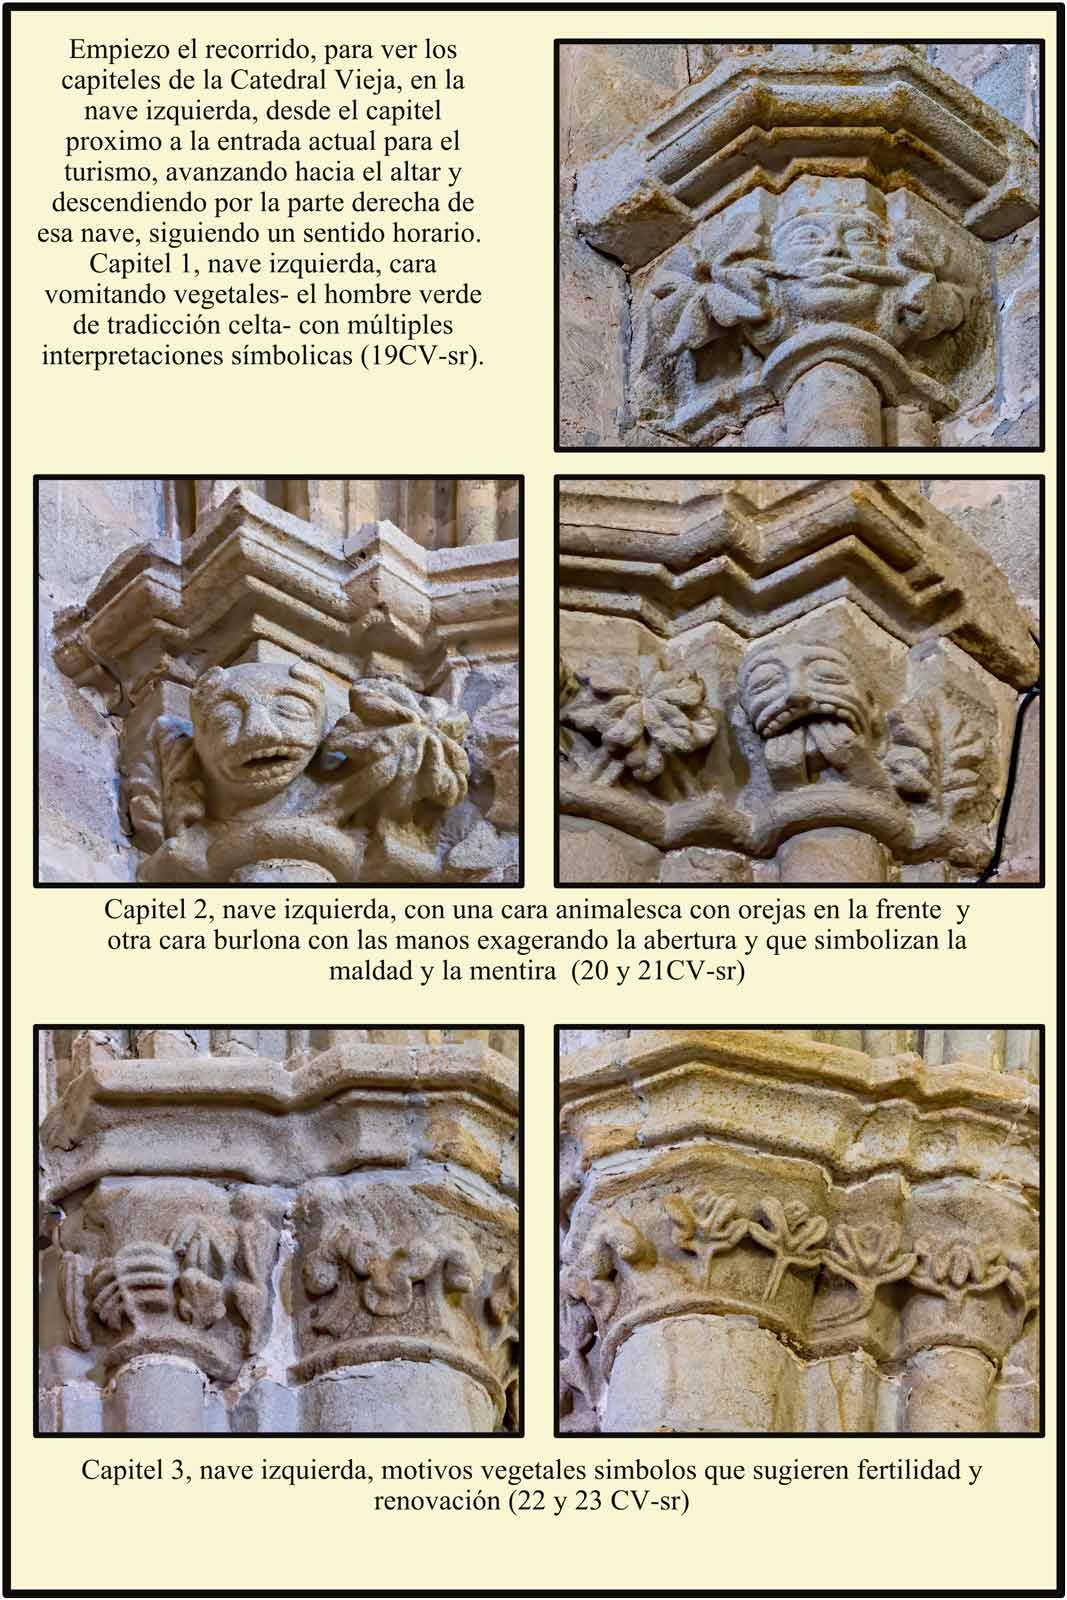 Catedral Vieja Plasencia capitel nave izquierda cara hombre verde cara mentira embustero